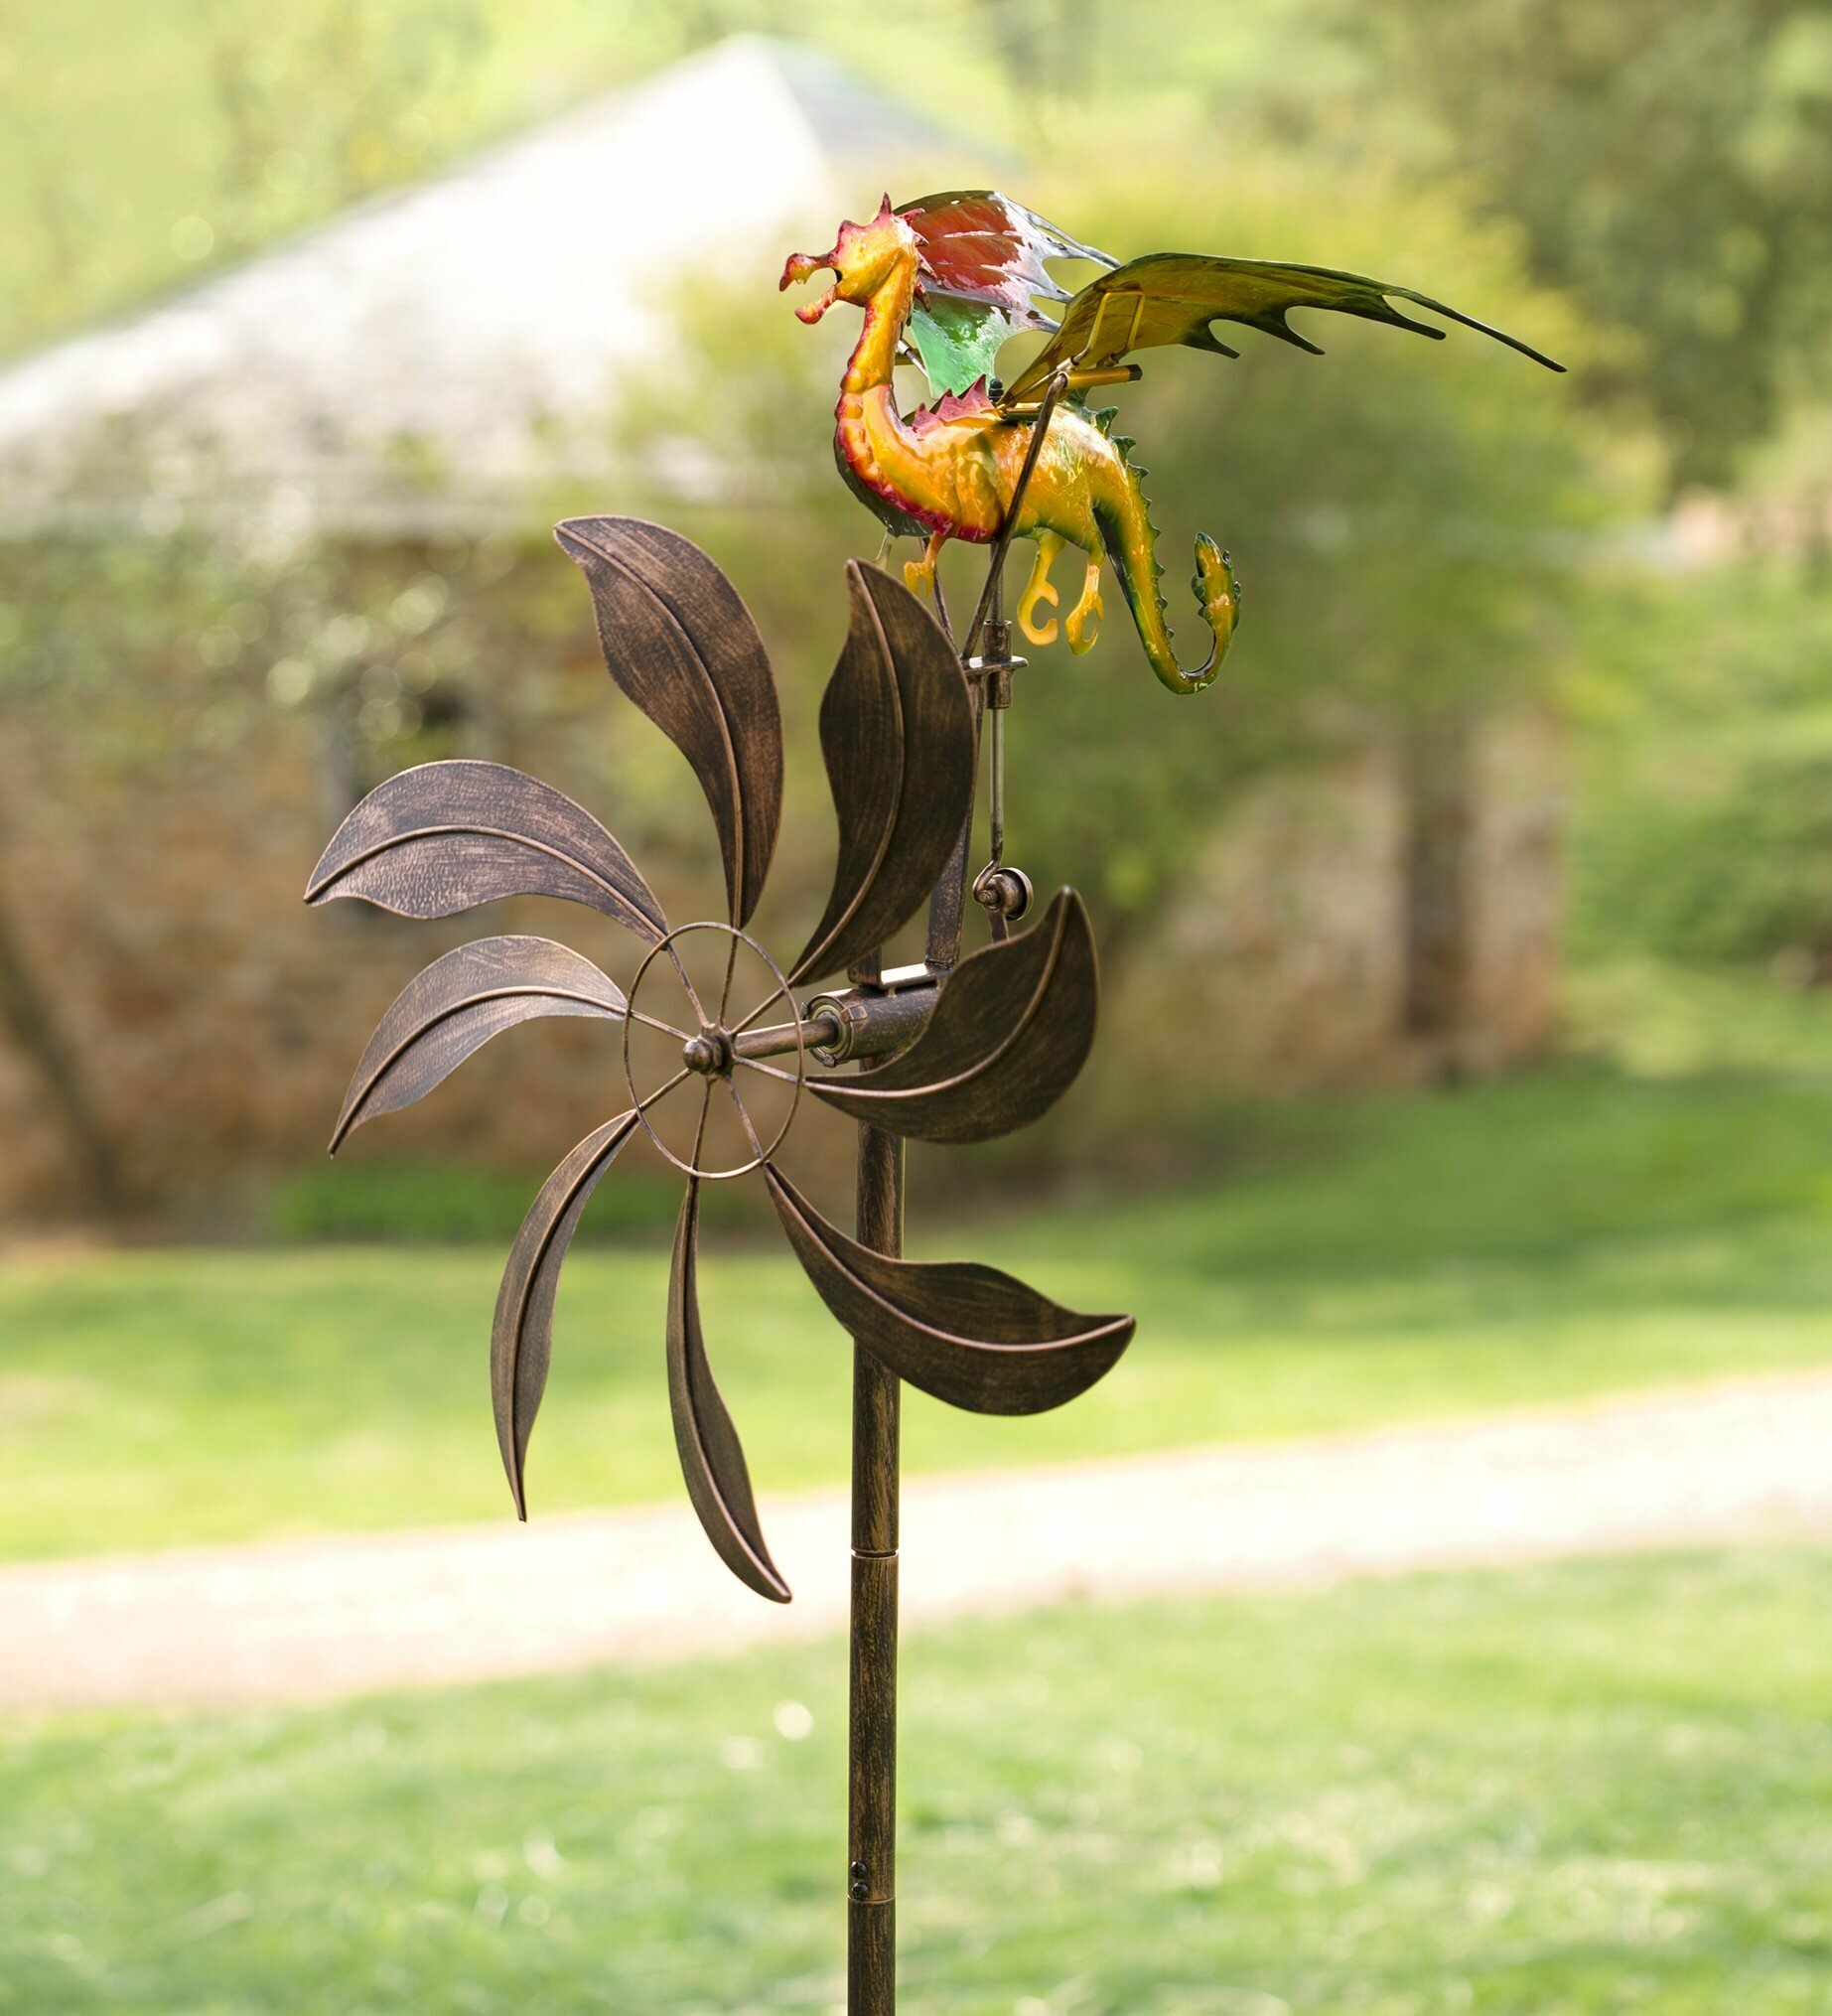 Wind & Weather Flying Dragon Wind Spinner | Wayfair